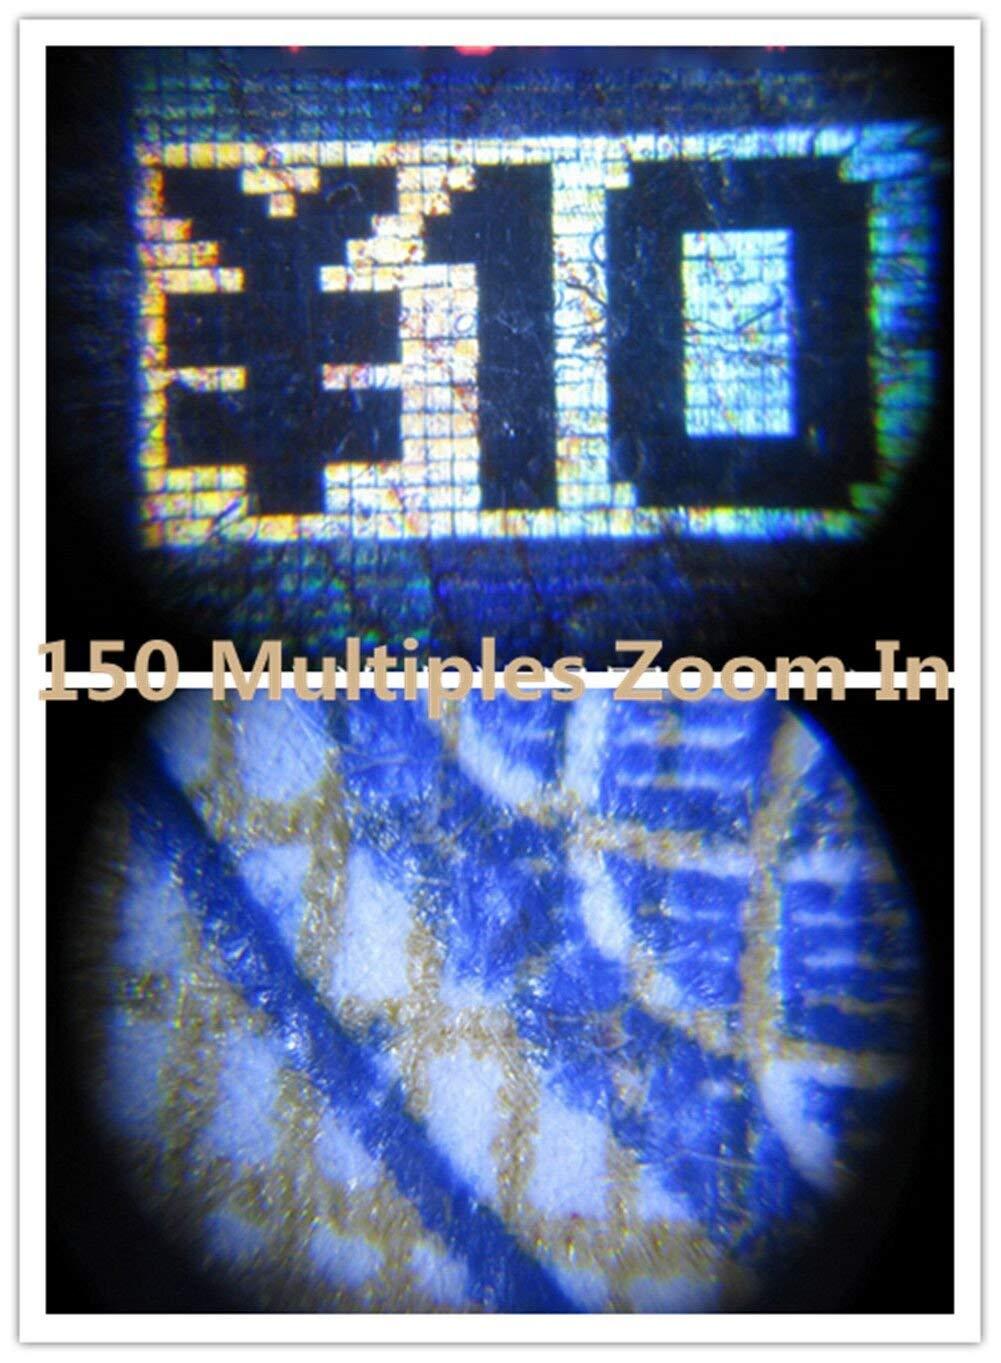 ZHJFDJ Lupa 150 Veces Tubo con Microscopio Microsc/ópico De Bolsillo De Escala L/ámpara LED Lupa De Gran Aumento